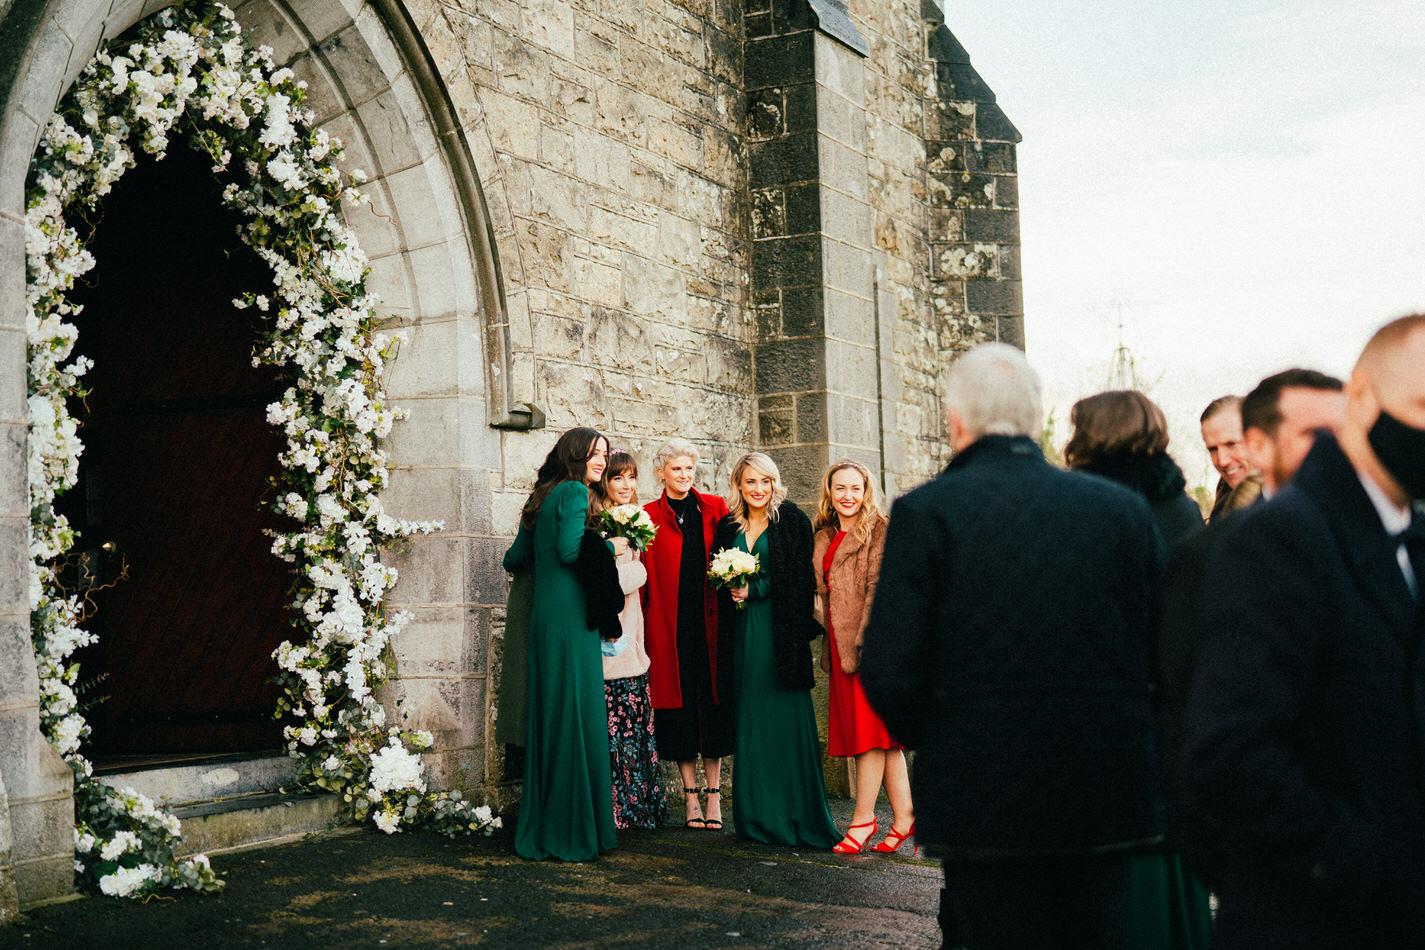 Castle-wedding-ireland-photos- 0170 119